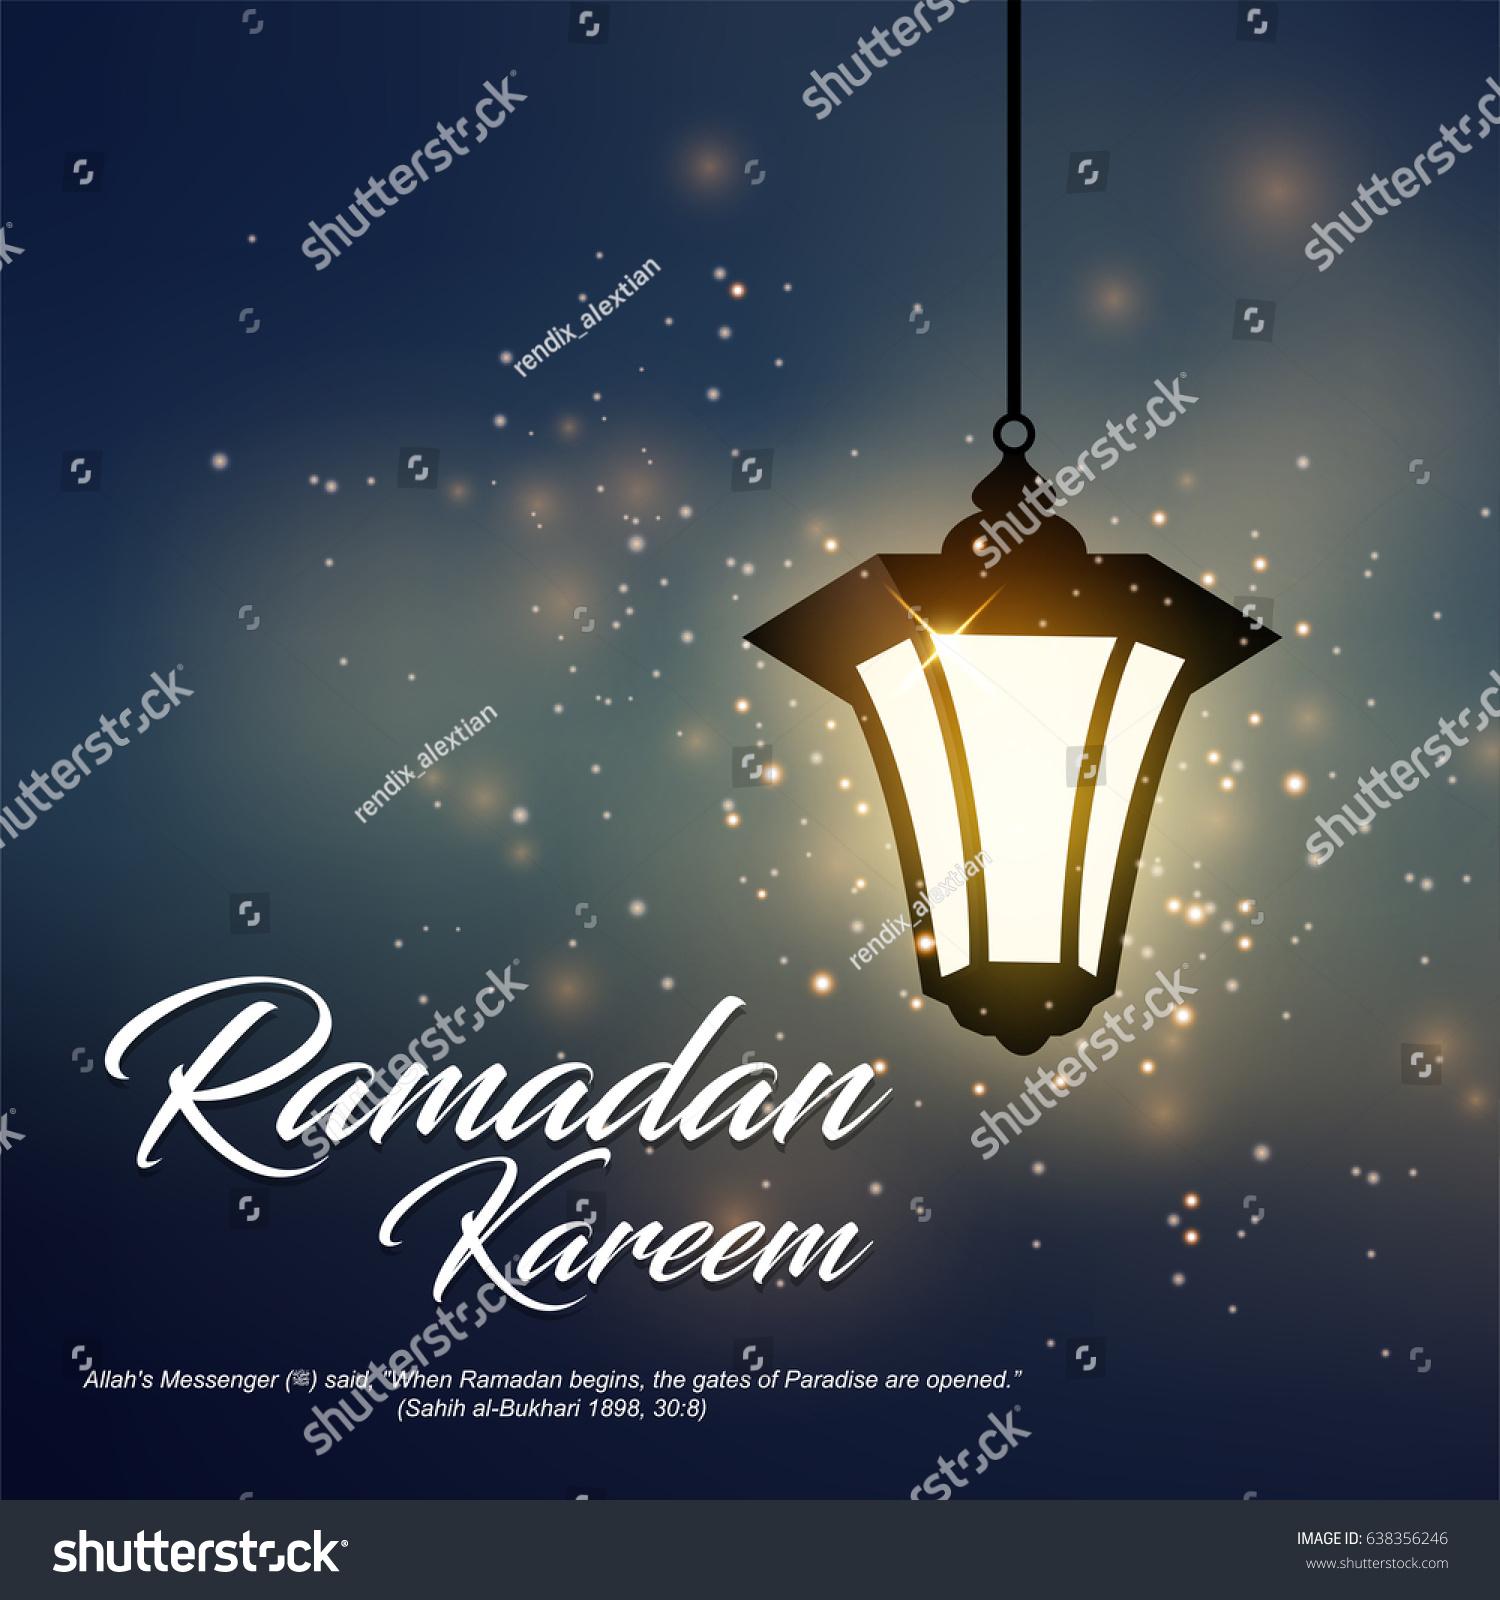 Ramadan Kareem Greeting Suitable Islamic Religion Stock Illustration